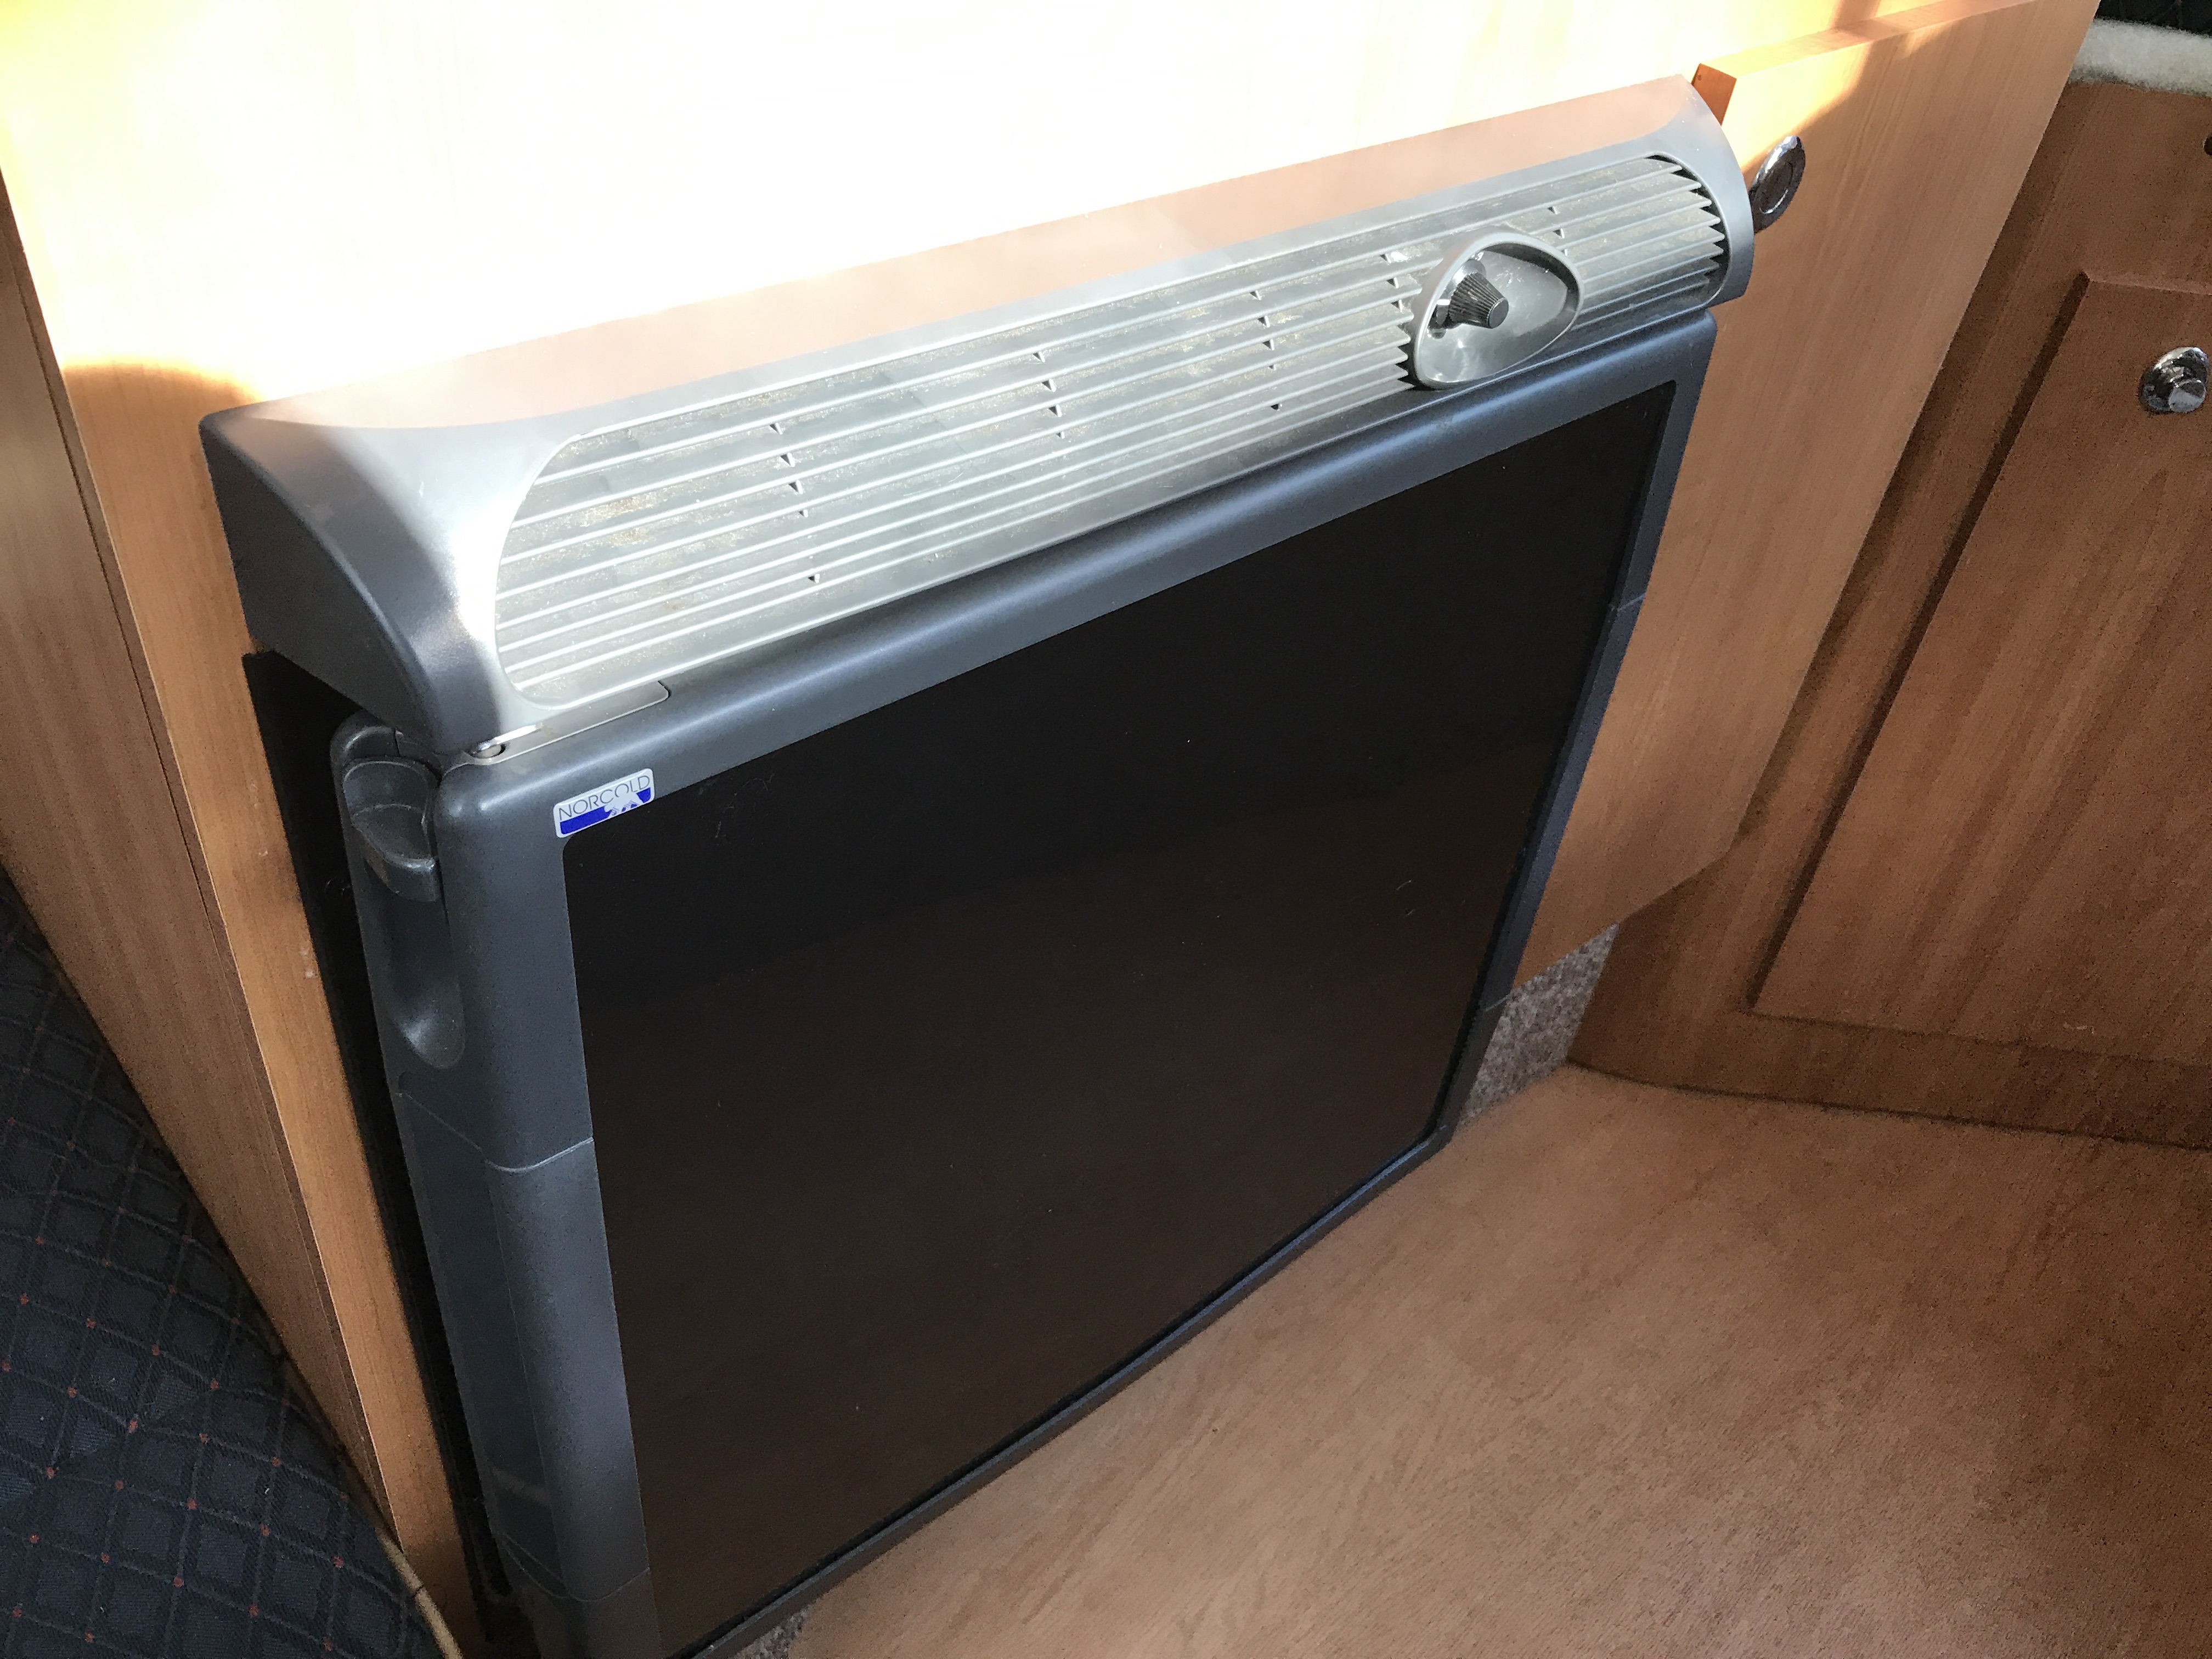 Bayliner Discovery 246 EC - refrigerator